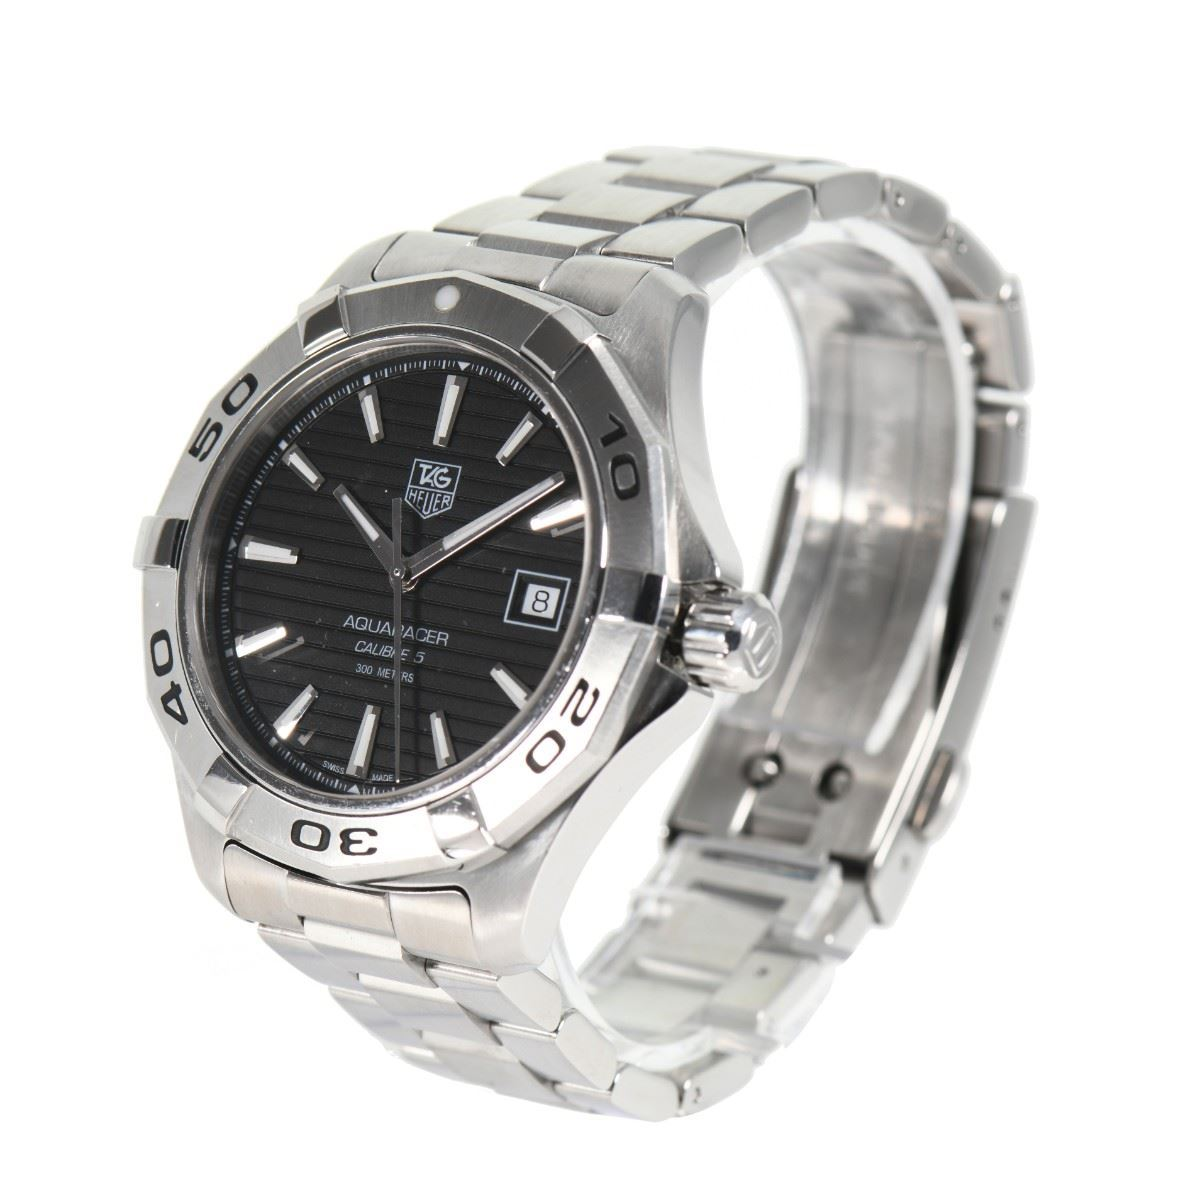 premium selection 4e372 4e0c6 Pre Owned Tag Heuer WAP2010 Aquaracer Men's 69Y@M Steel Watch